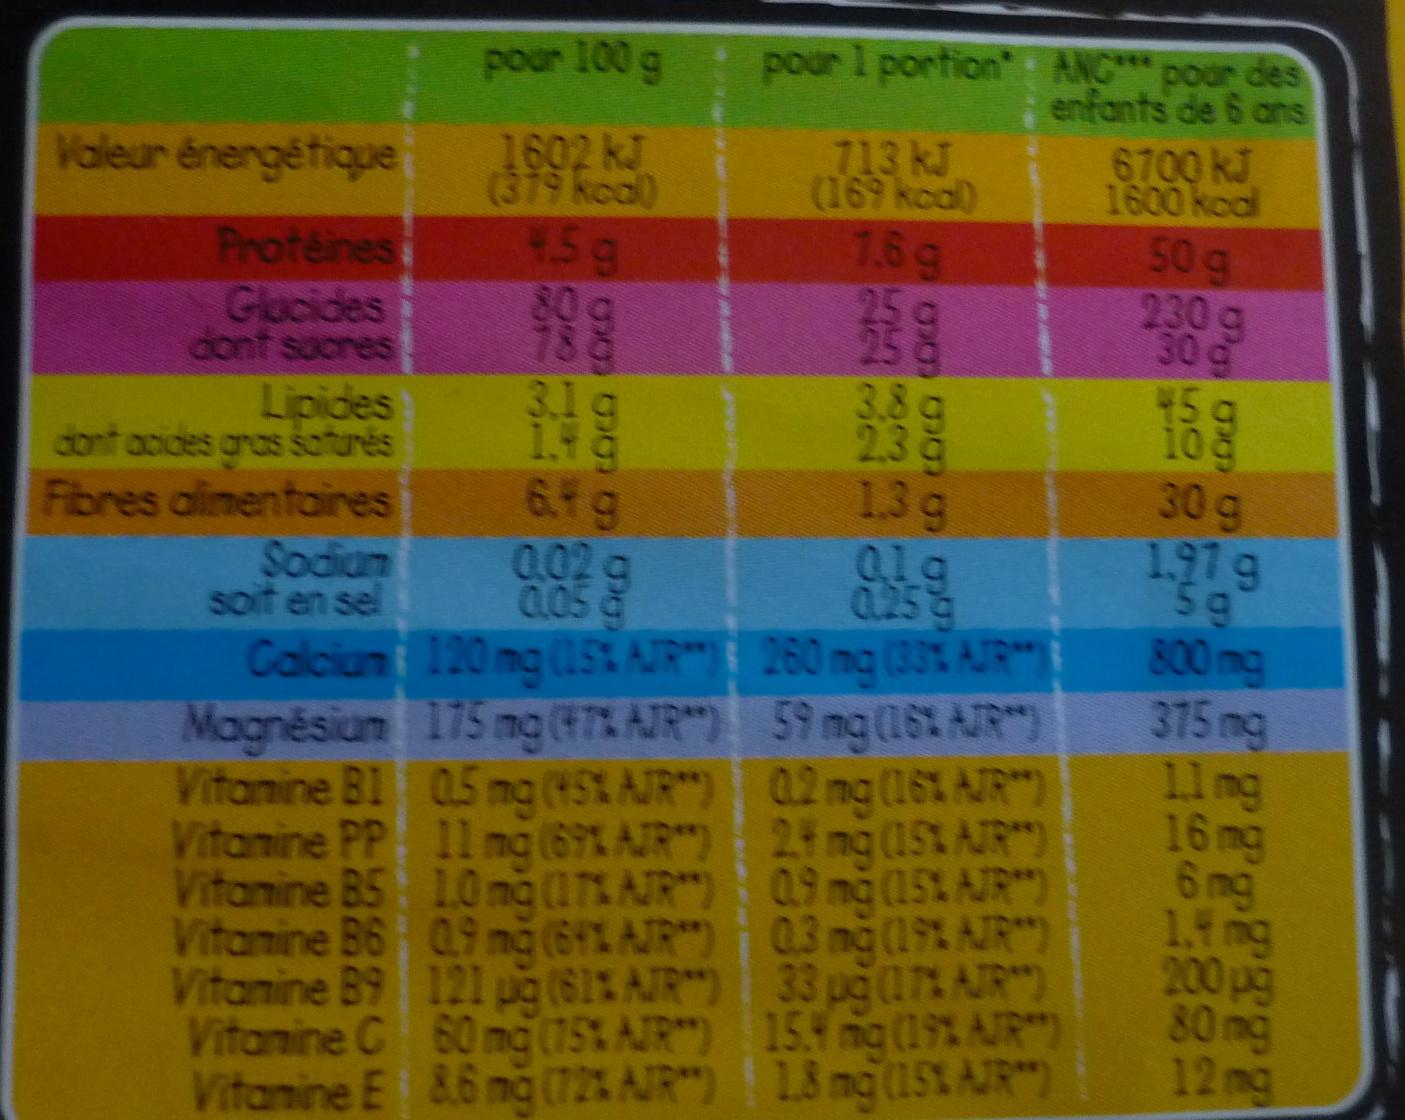 Poudre instantanée - Información nutricional - fr